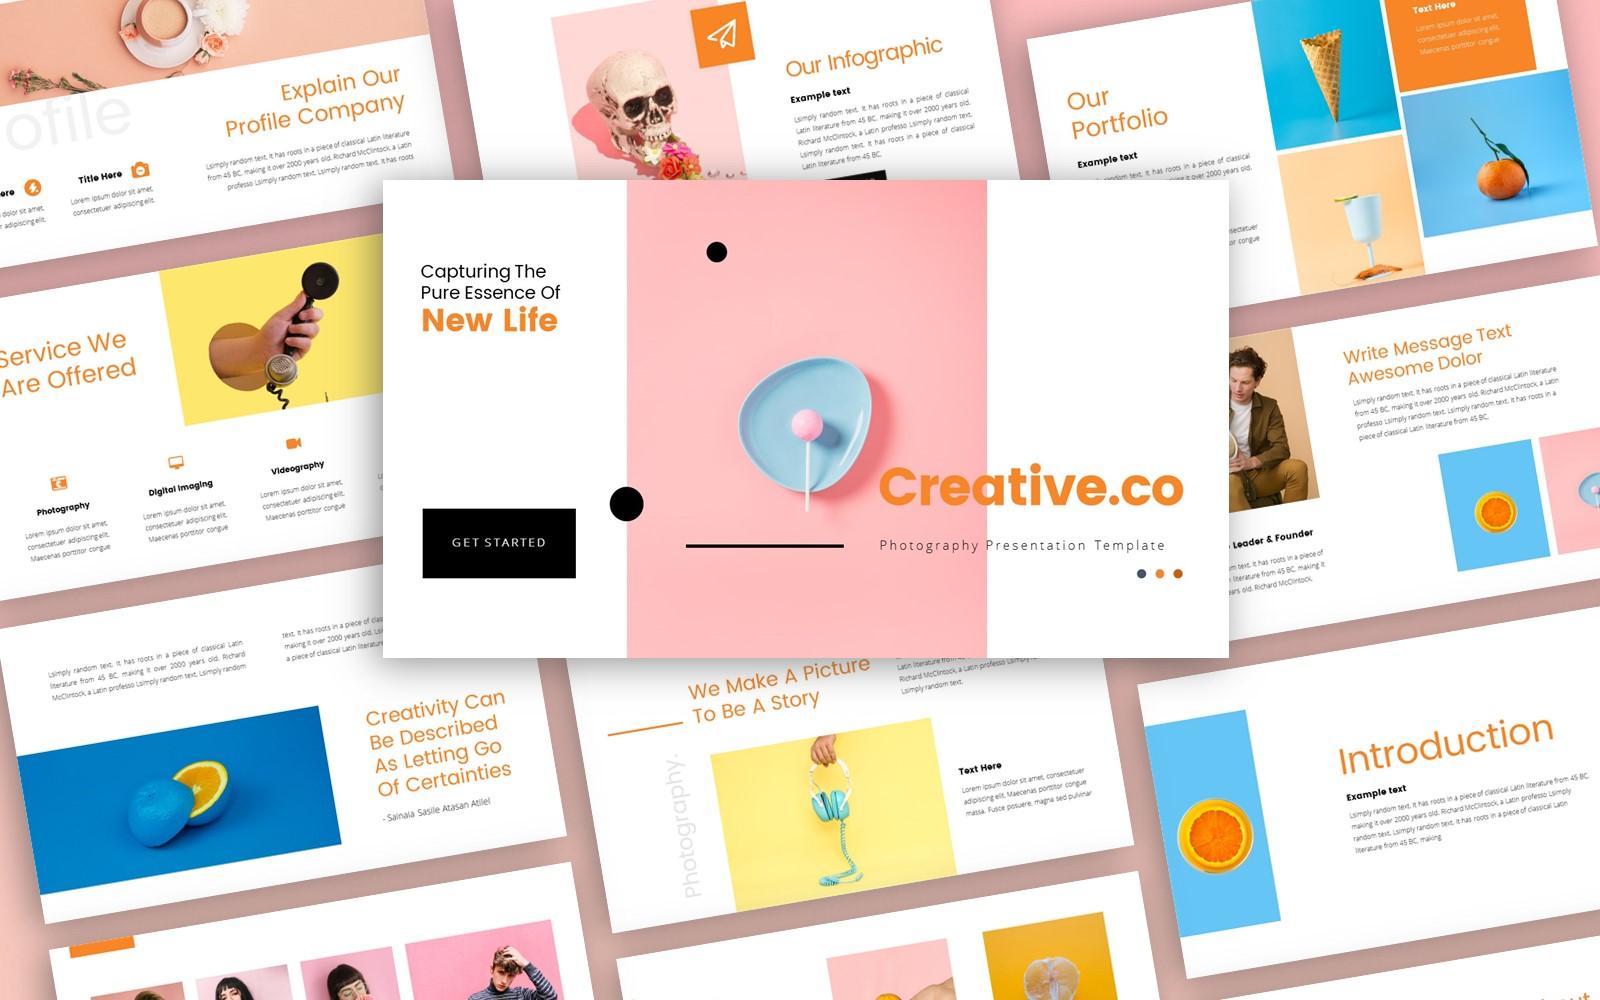 Creative.co Creative Presentation PowerPoint Template